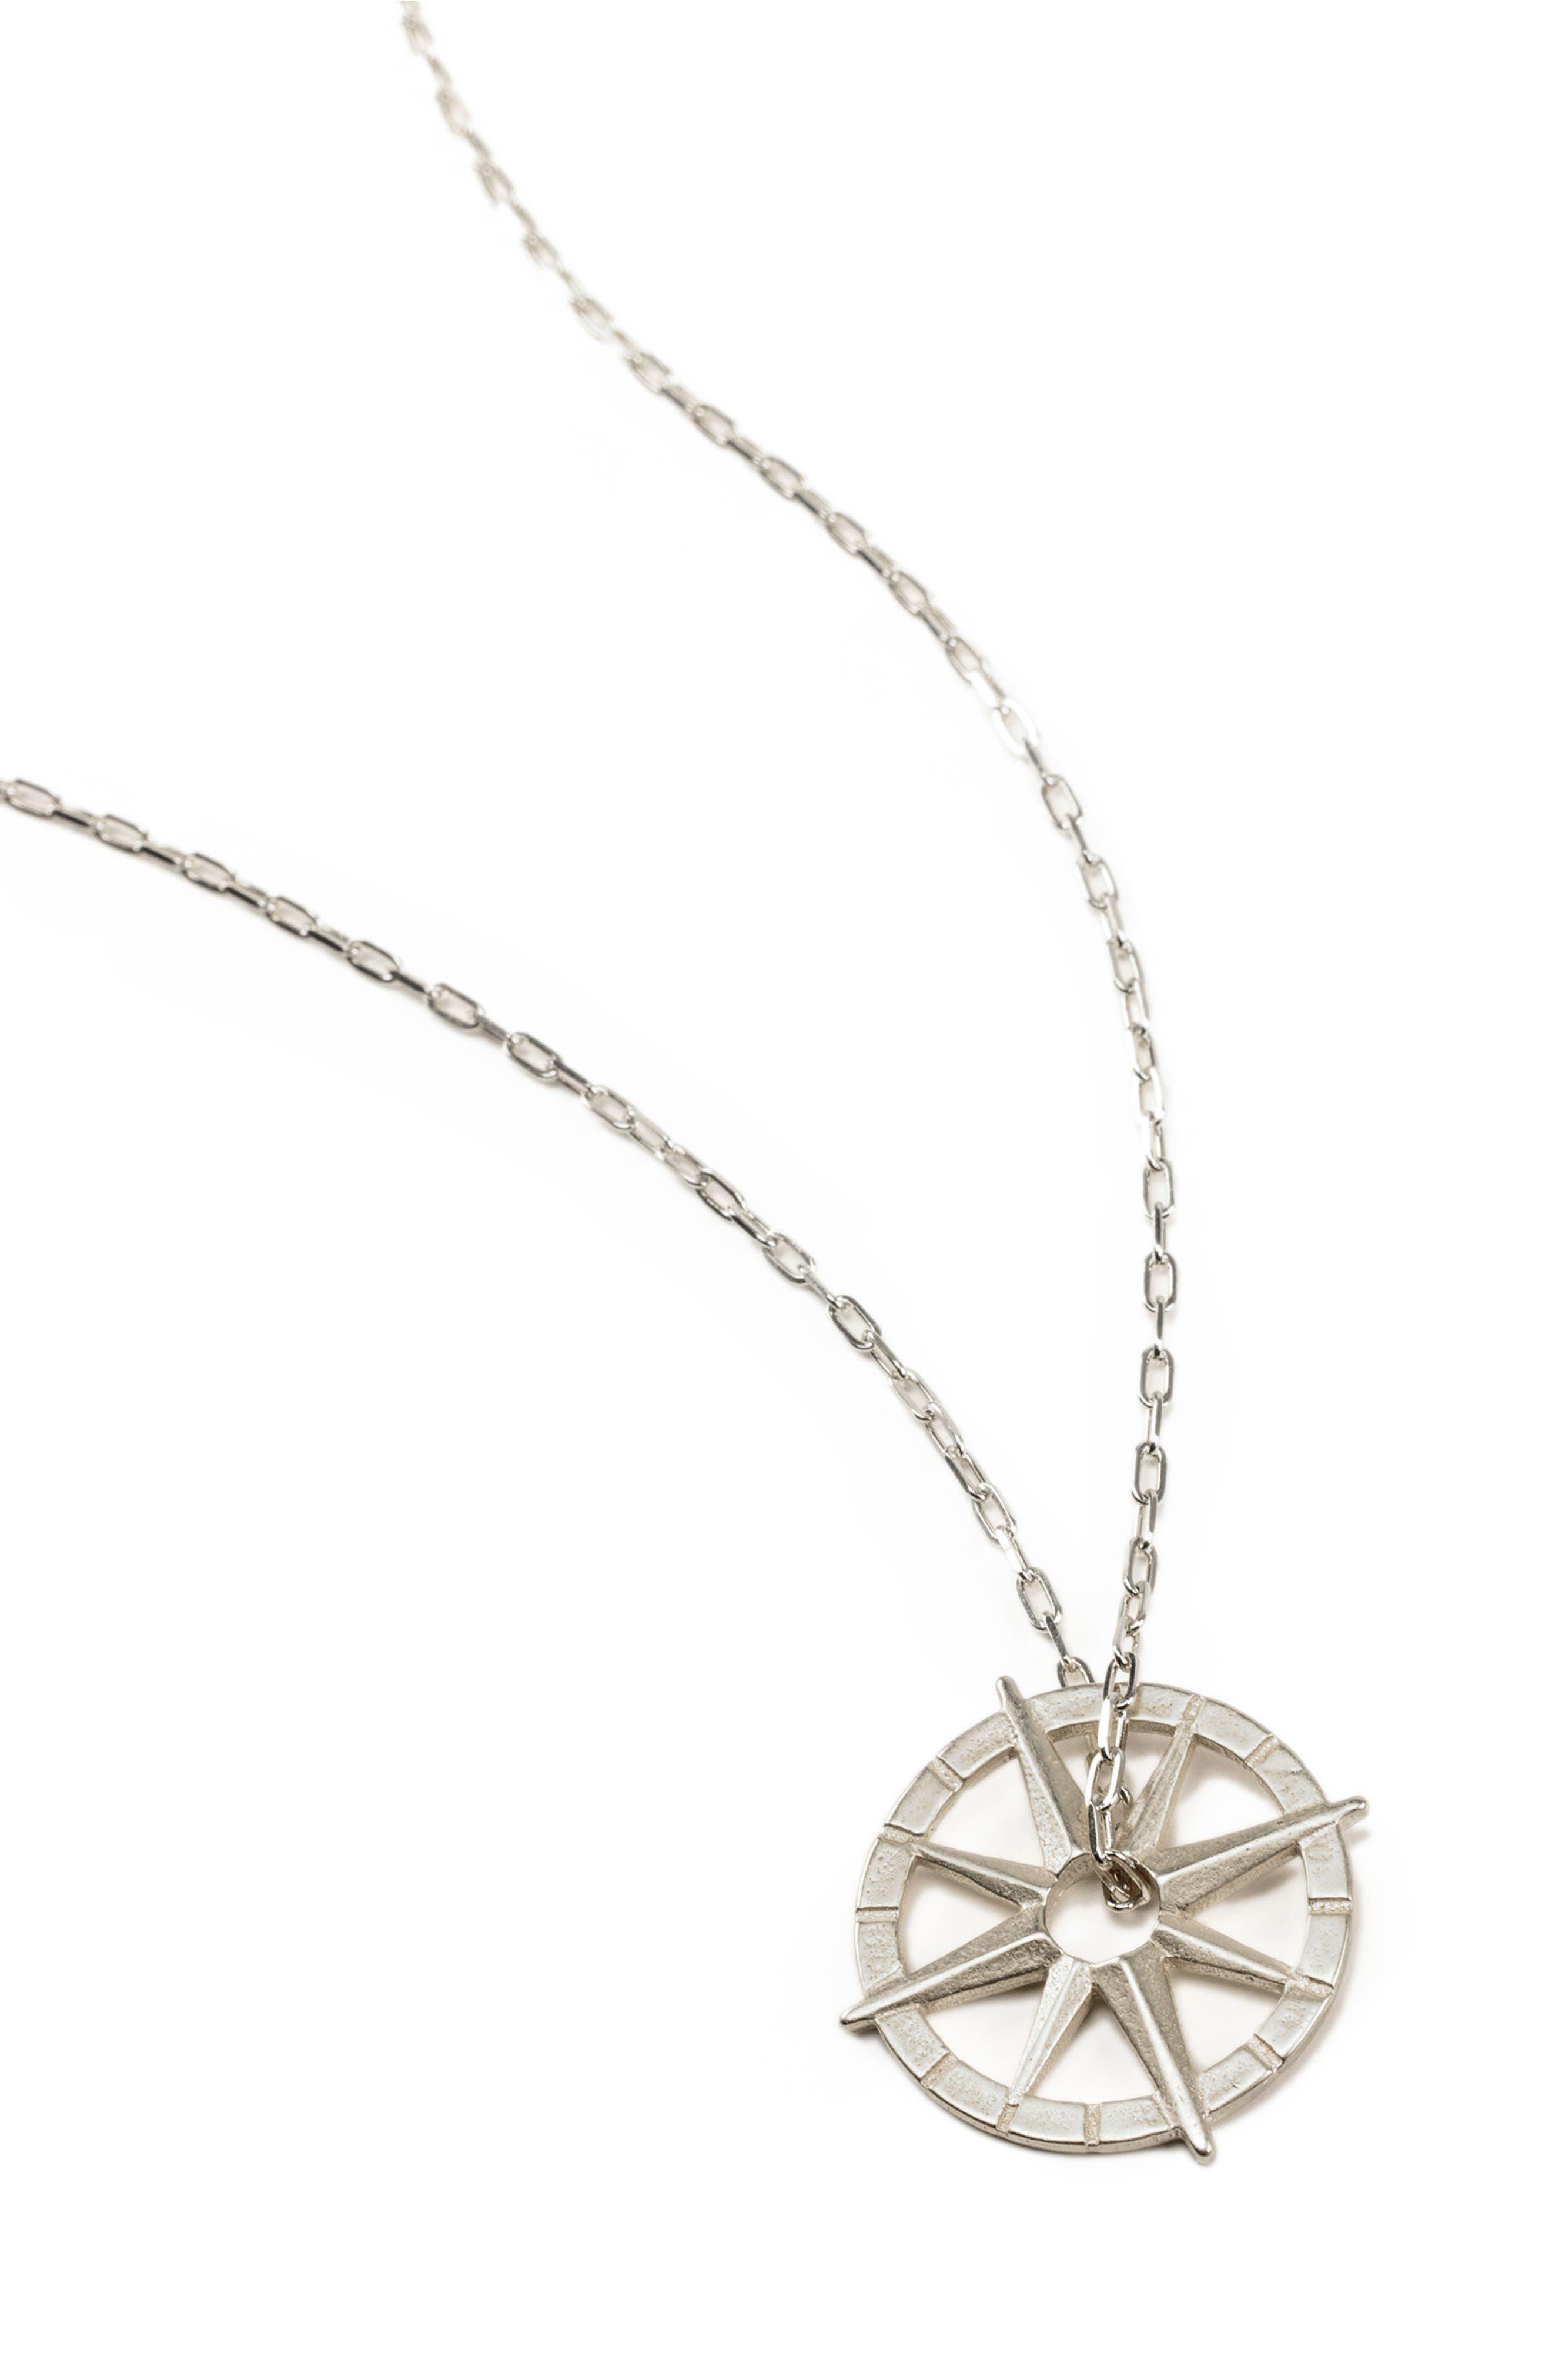 Petalbox North Star Compass Pendant Necklace,                             Alternate thumbnail 3, color,                             040